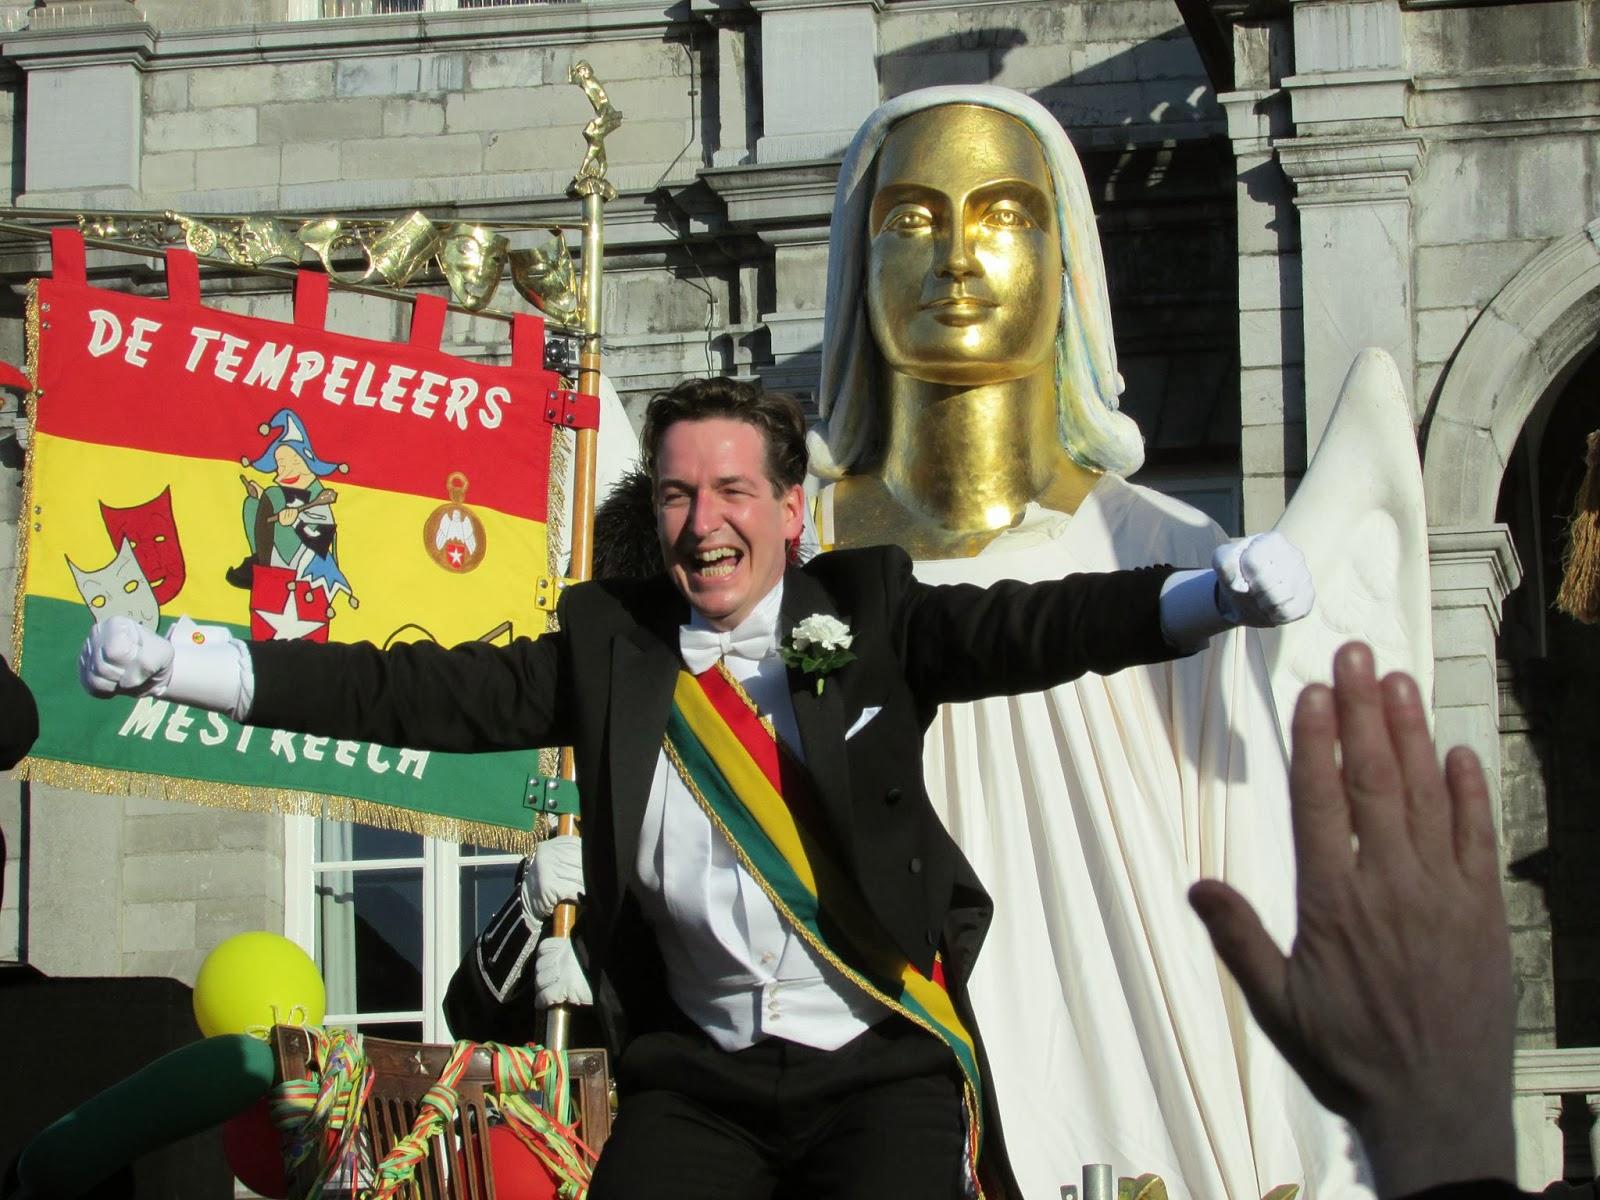 Prins Carnaval 2014 Henri de Eerste